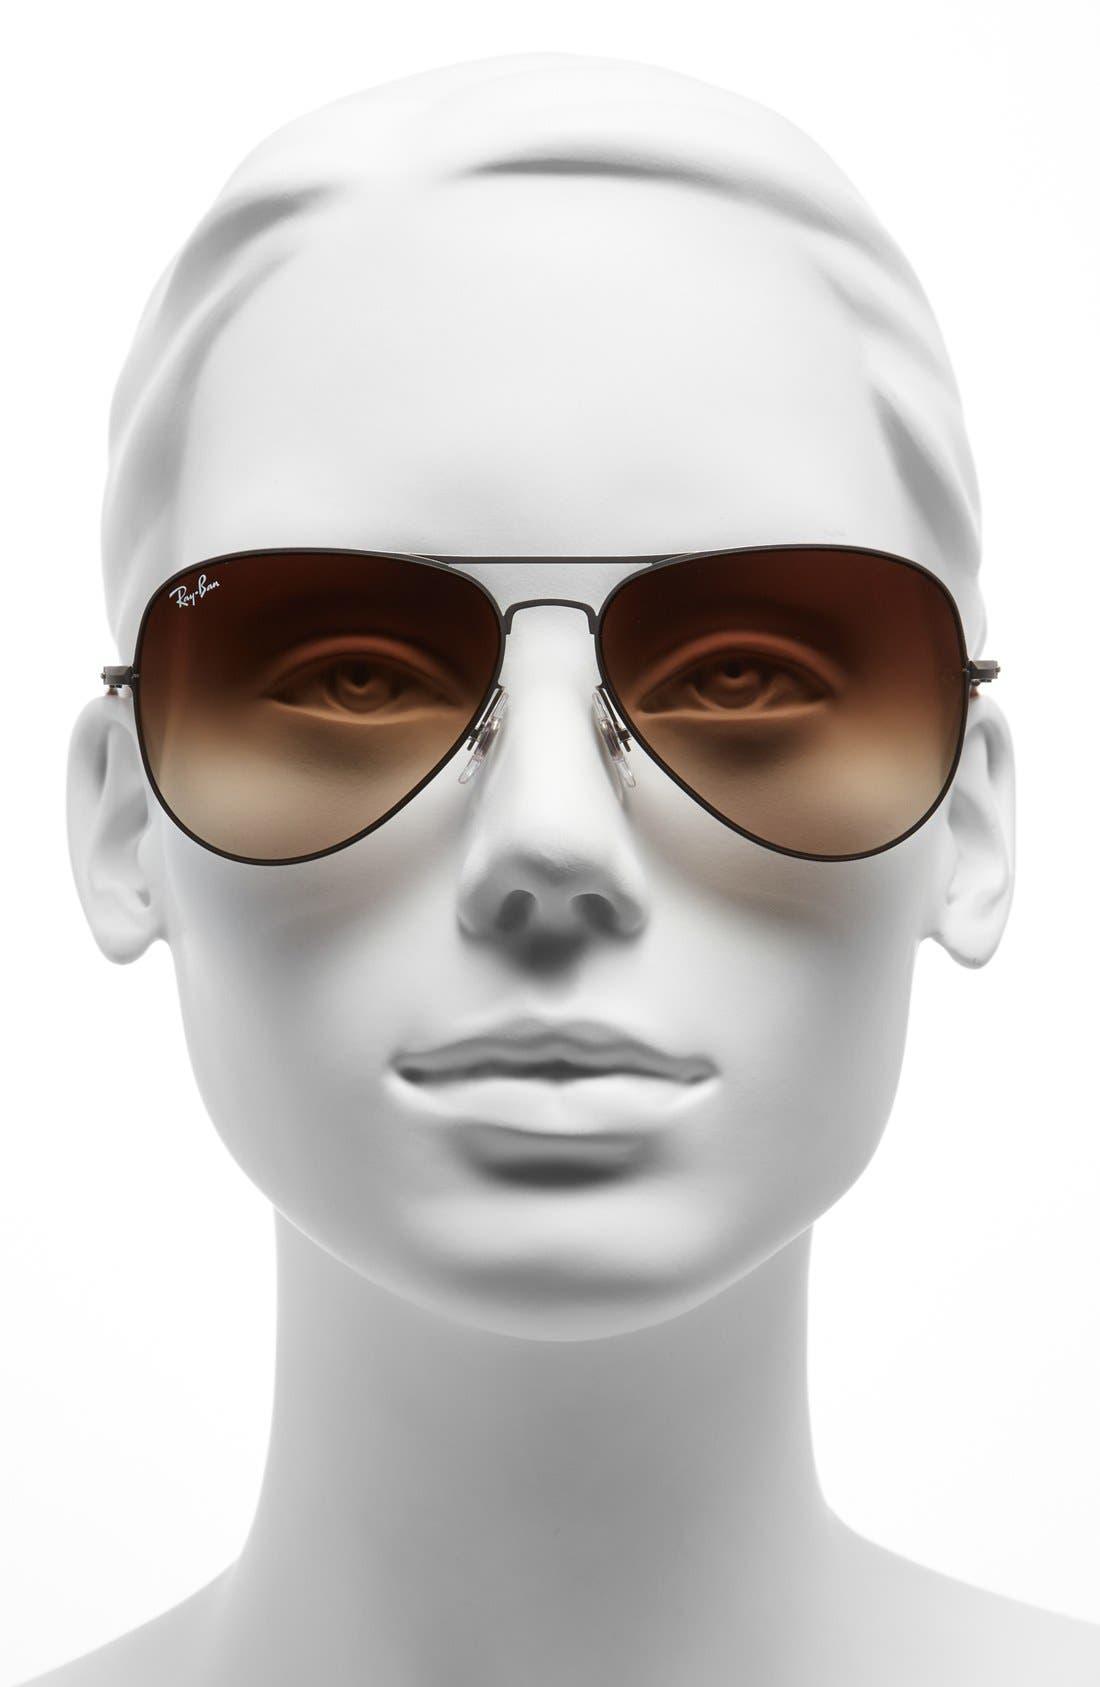 58mm Steel Aviator Sunglasses,                             Alternate thumbnail 2, color,                             064